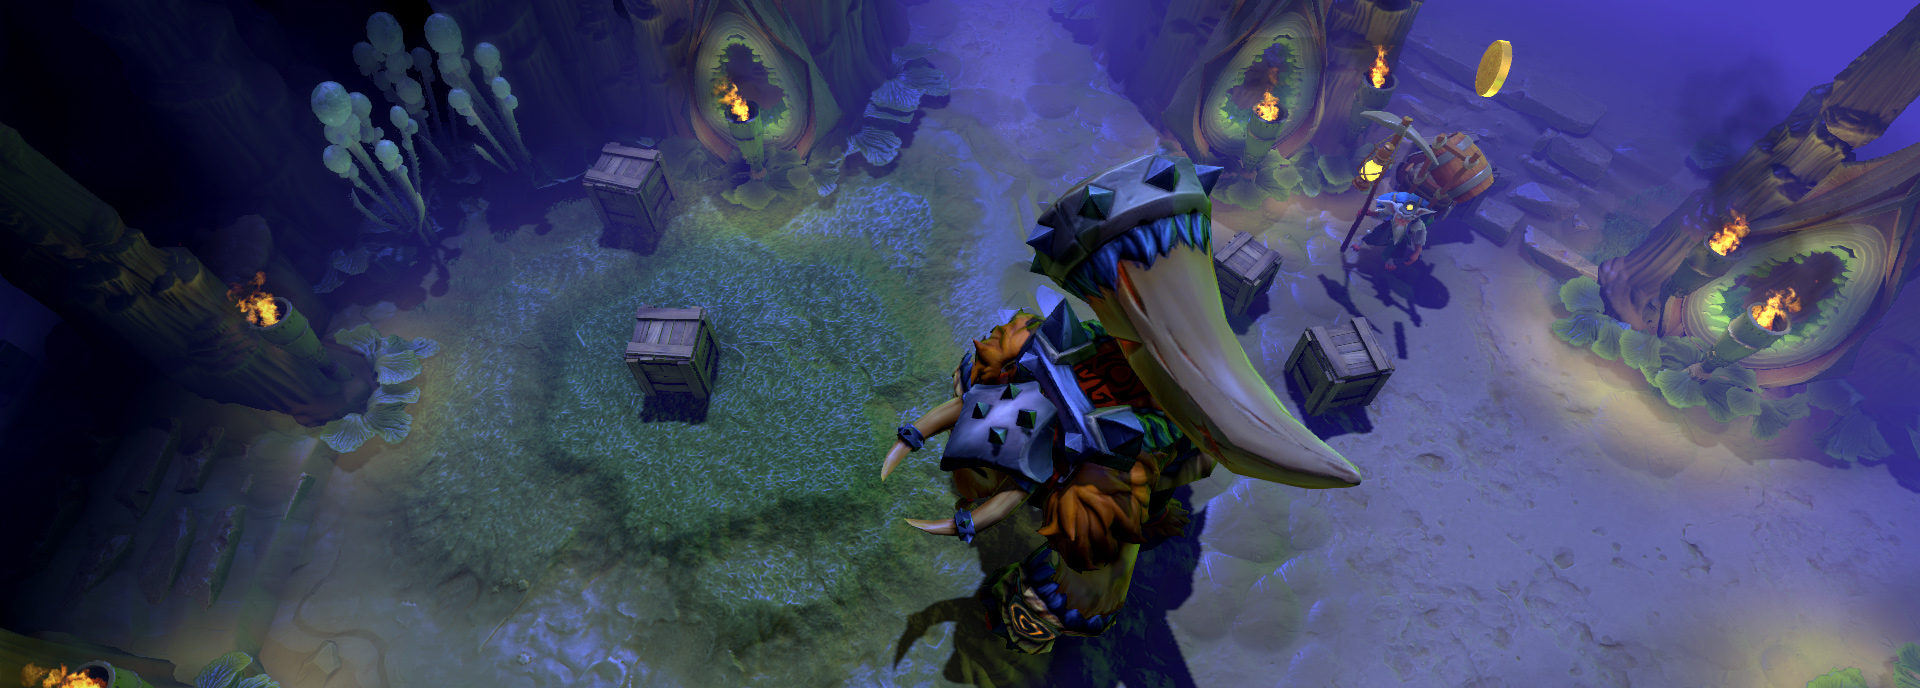 The Underhollow Preview 01.jpg